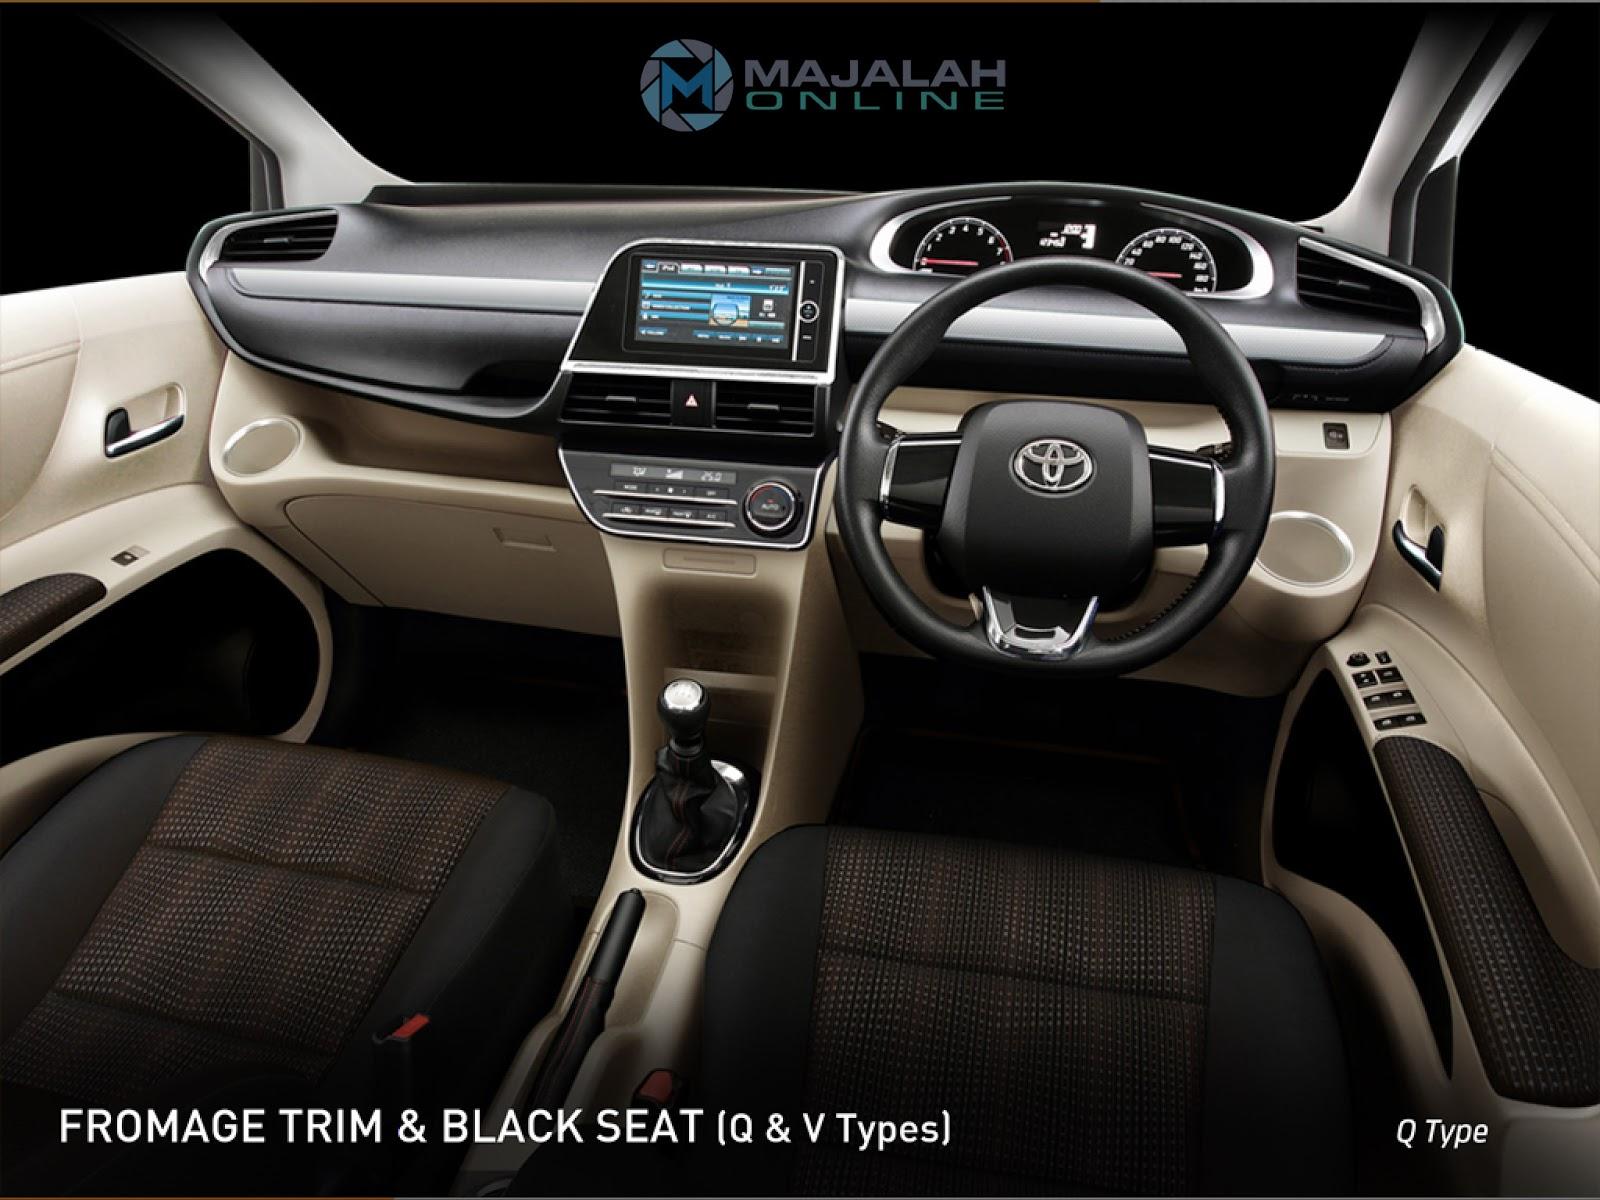 Toyota Sienta : Fromage Trim & Black Seat (Q & V Types)